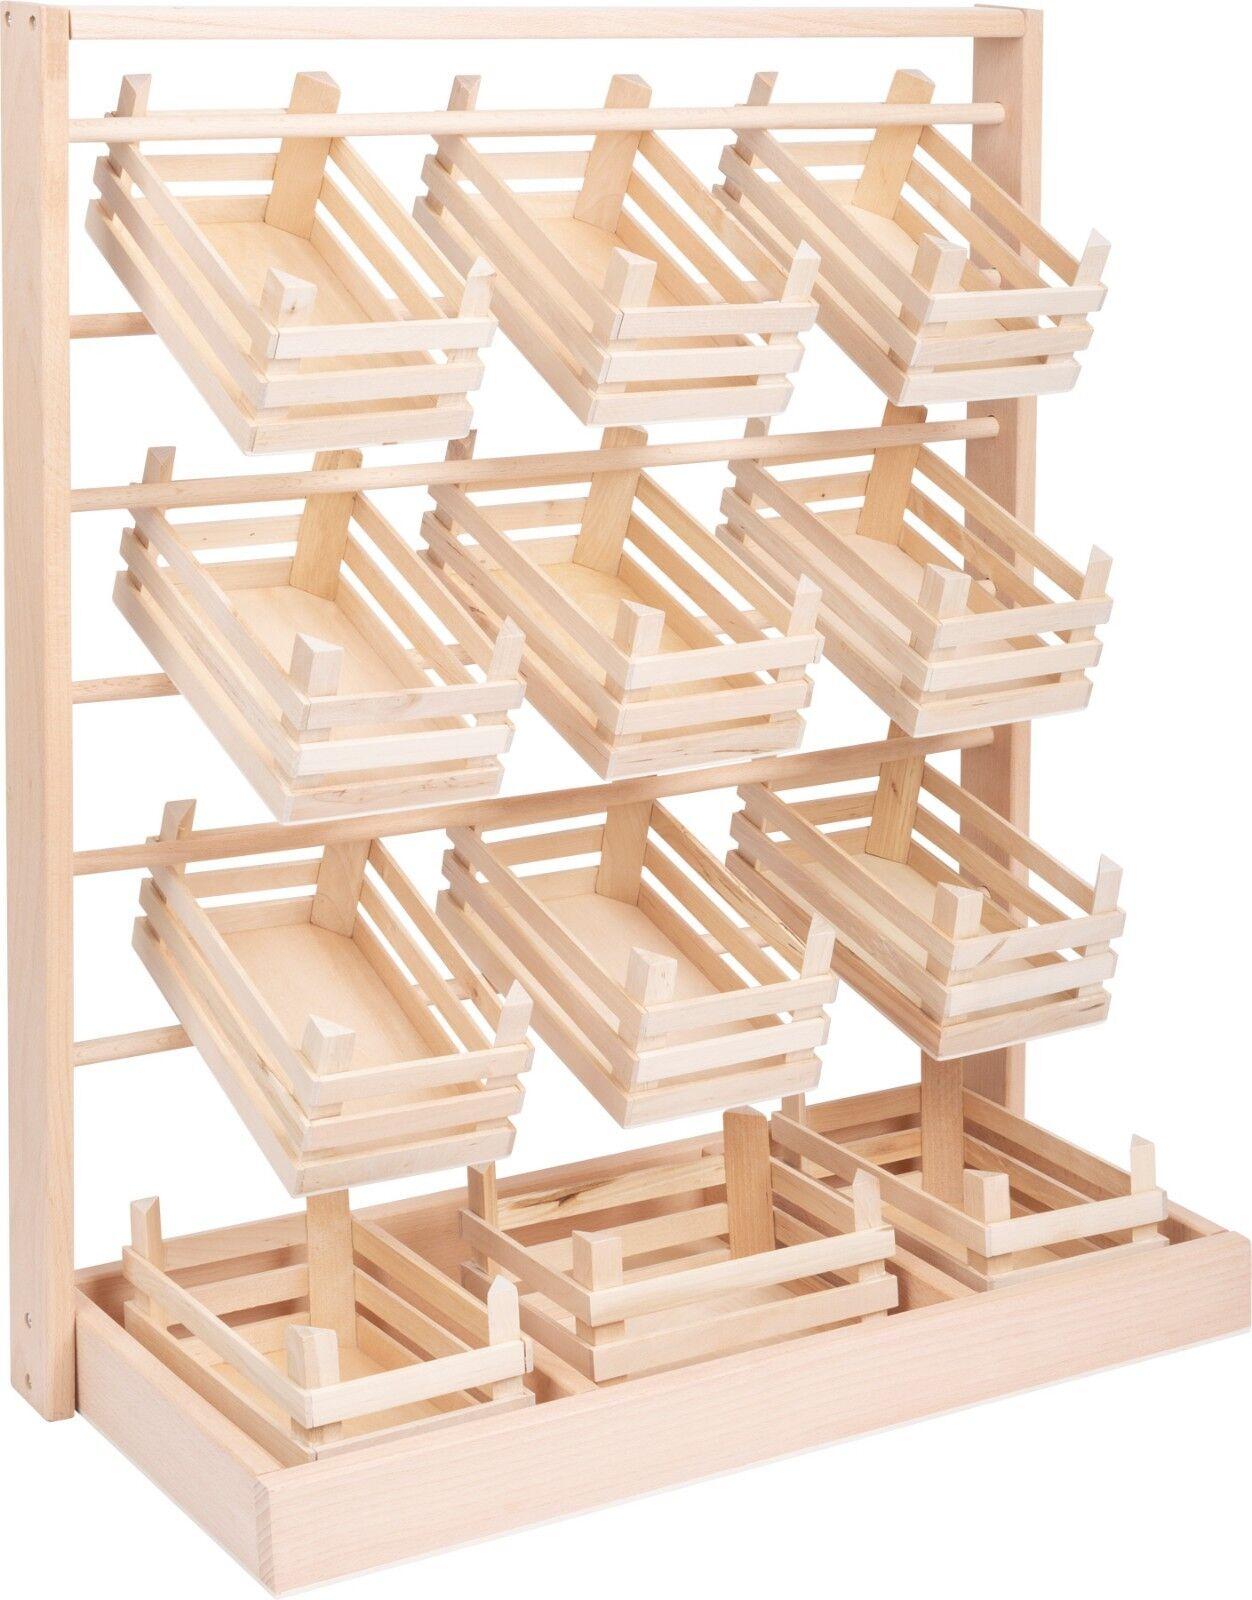 Verkaufsstand mit 12 großen Kisten (leer) Holz ca. 60 x 24 x 67 cm